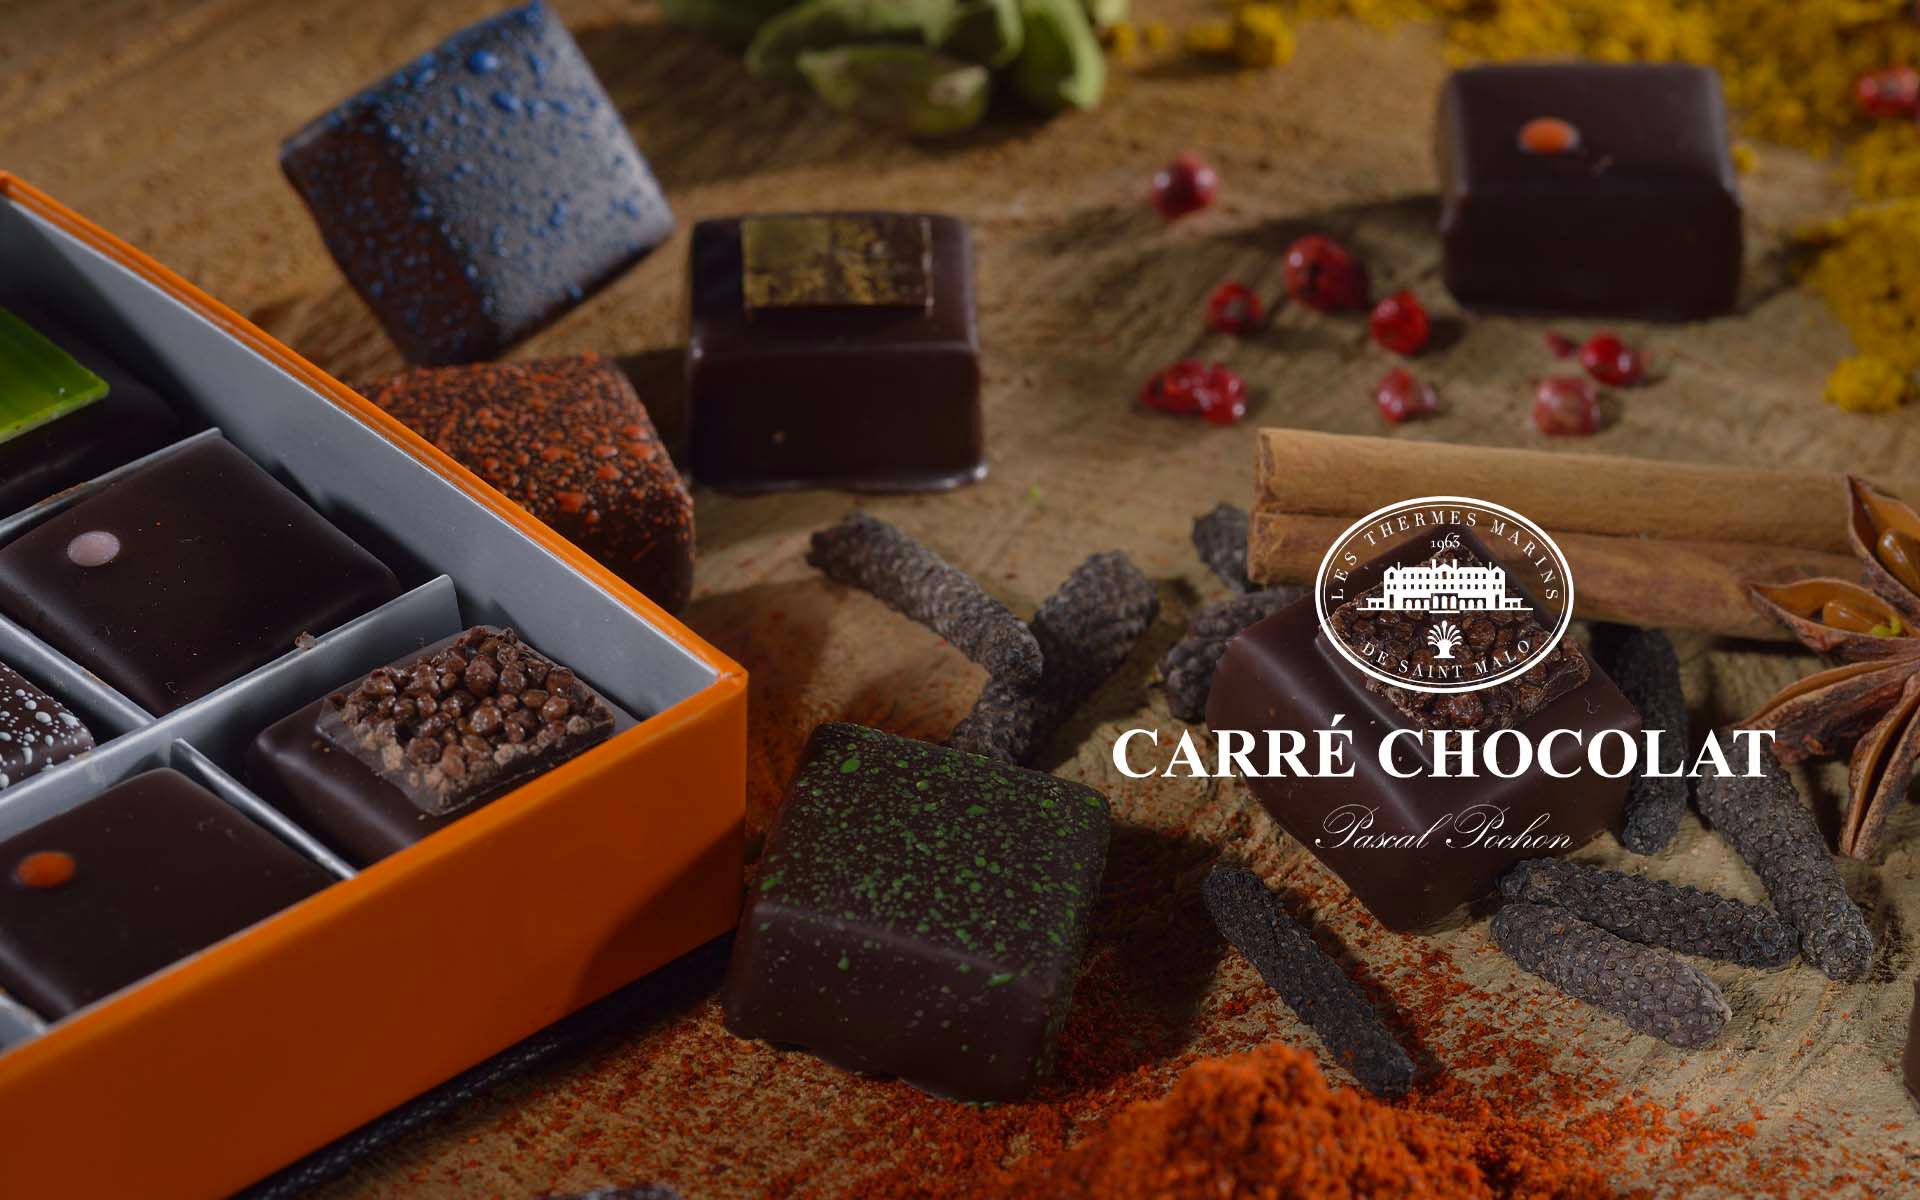 Carré Chocolat - Pascal Pochon